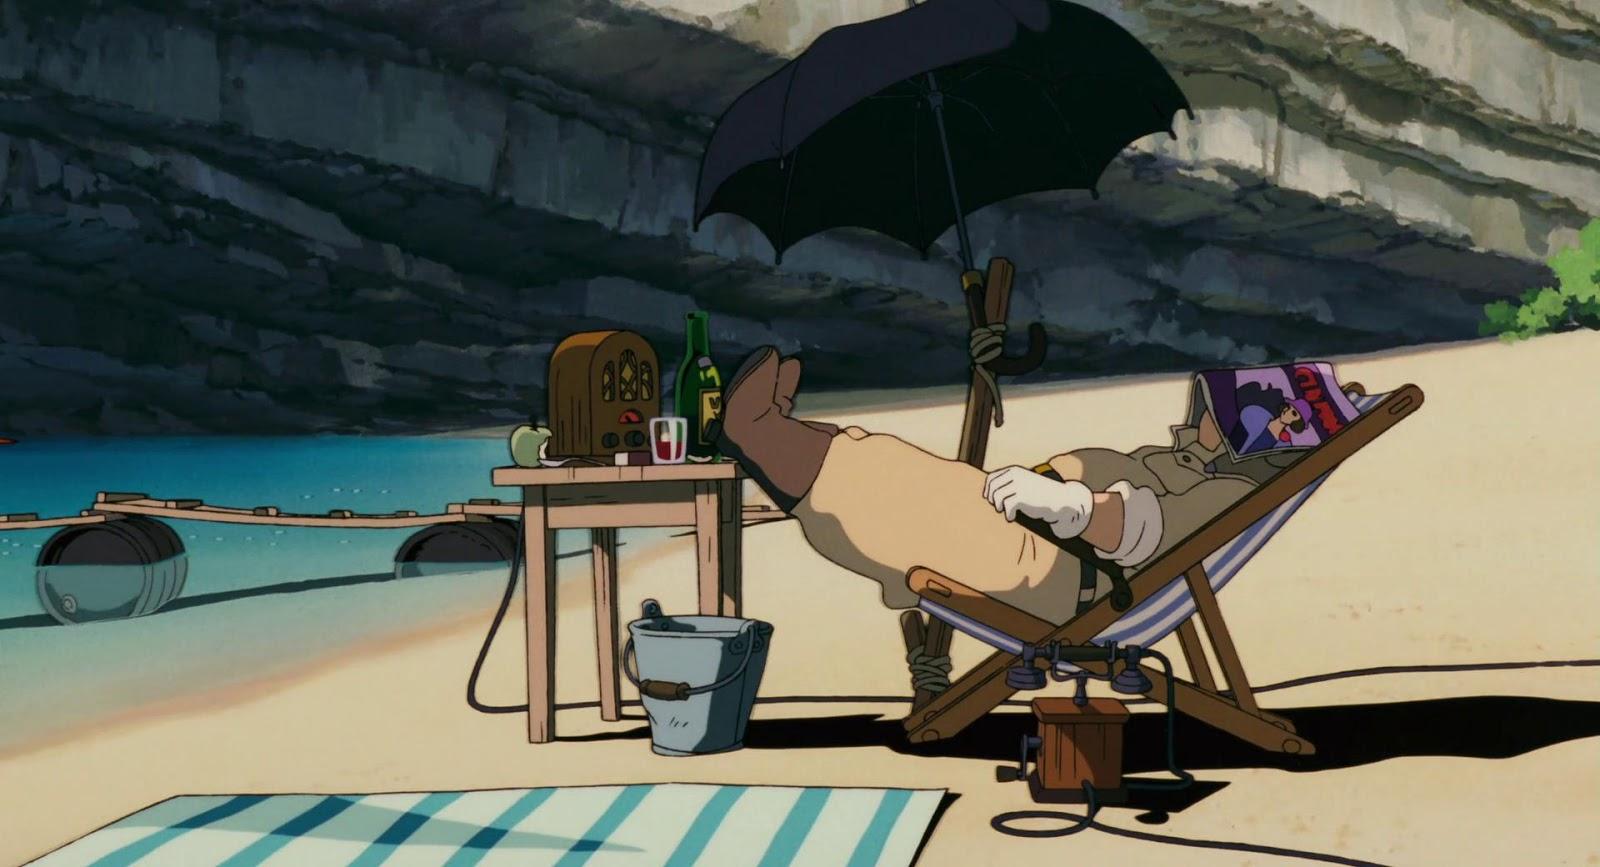 Kadr z filmu Szkarłatny Pilot, Porco Rosso